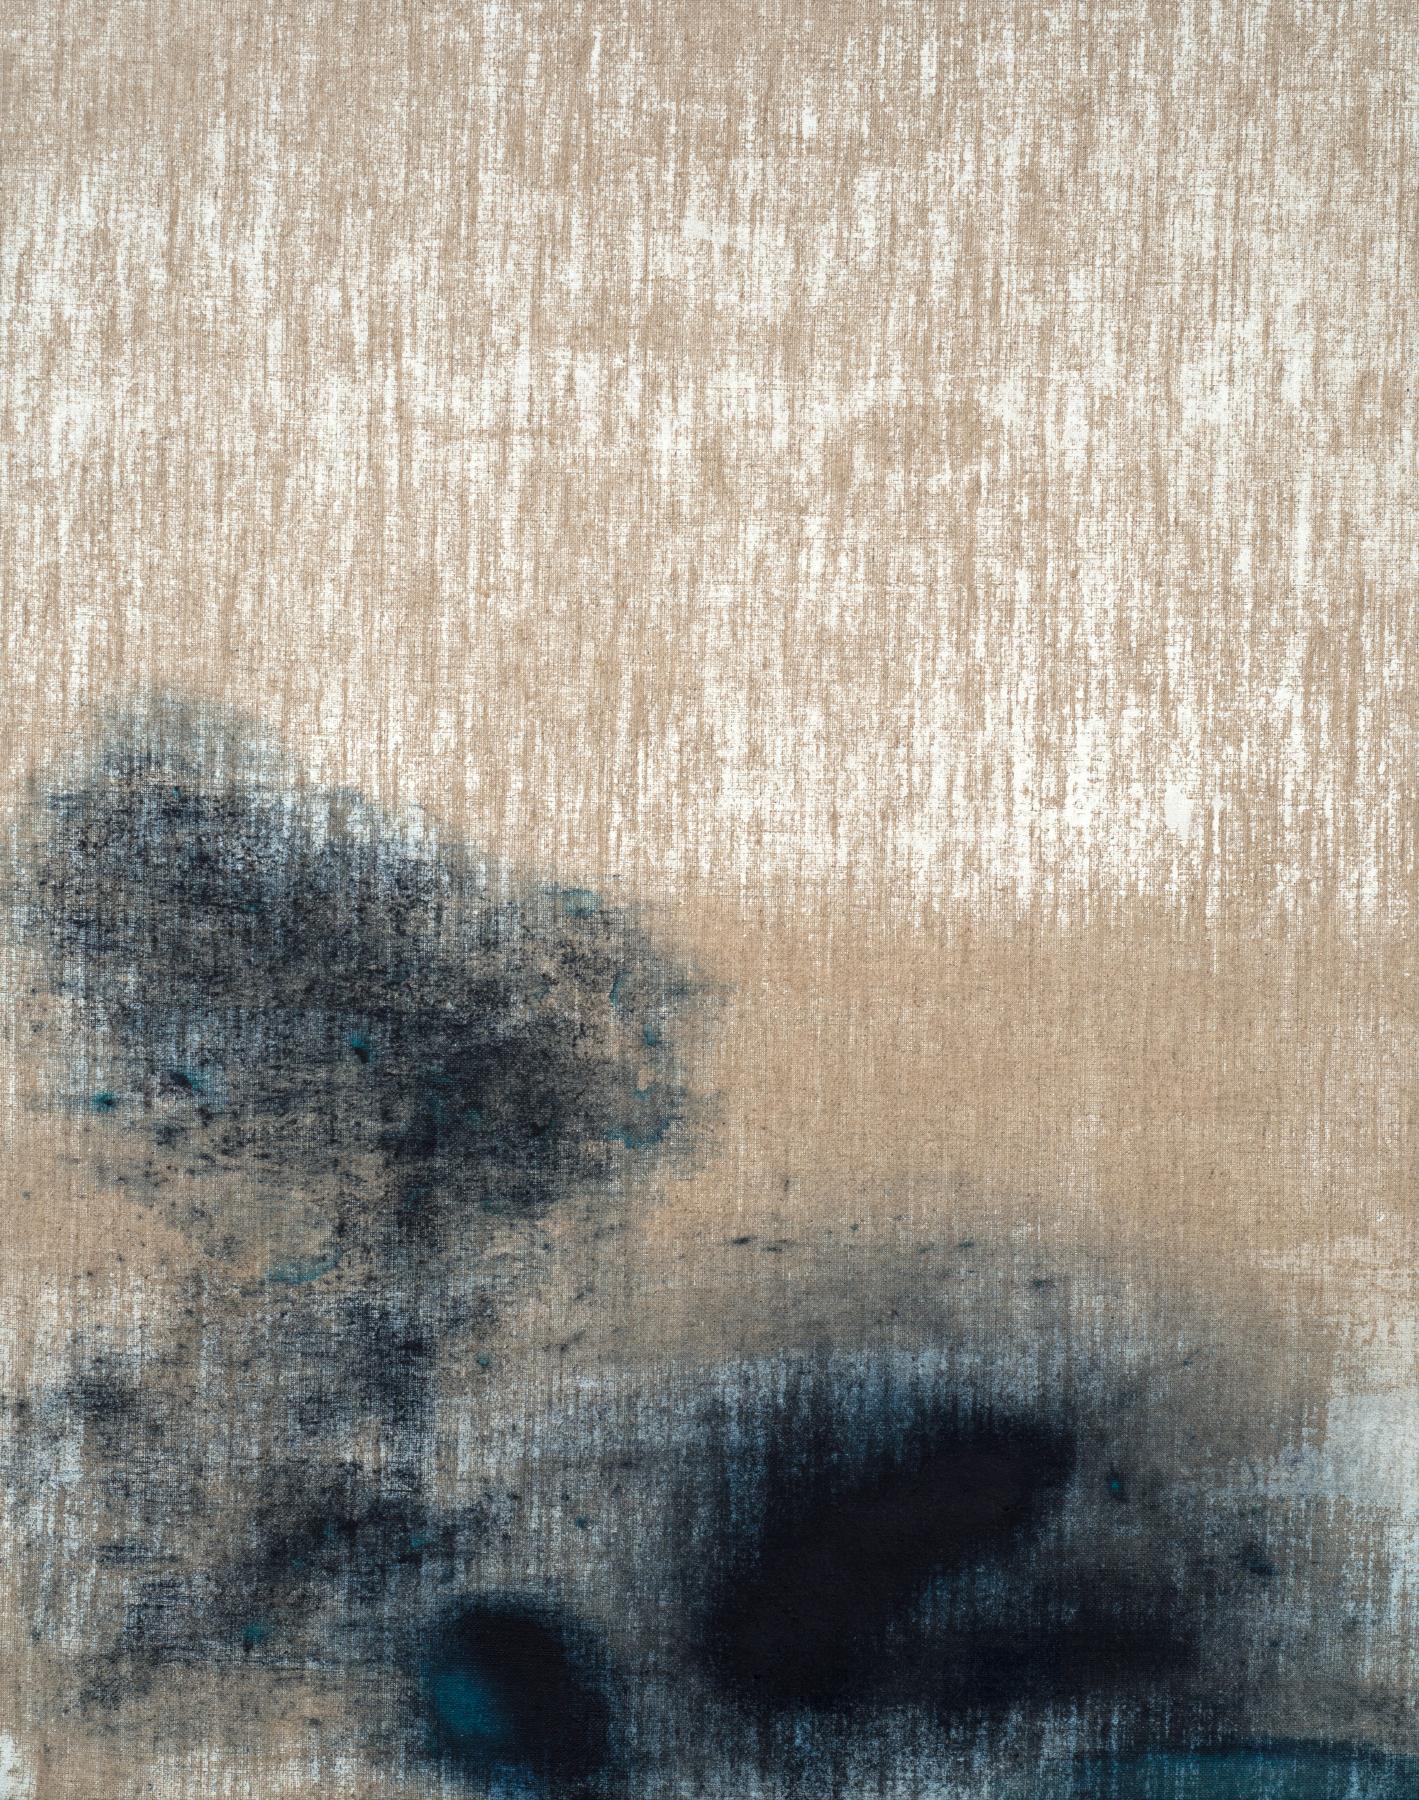 Untitled (Genuine Indigo) , 2017 Indigo pigment and acrylic on linen 20 x 16 inches